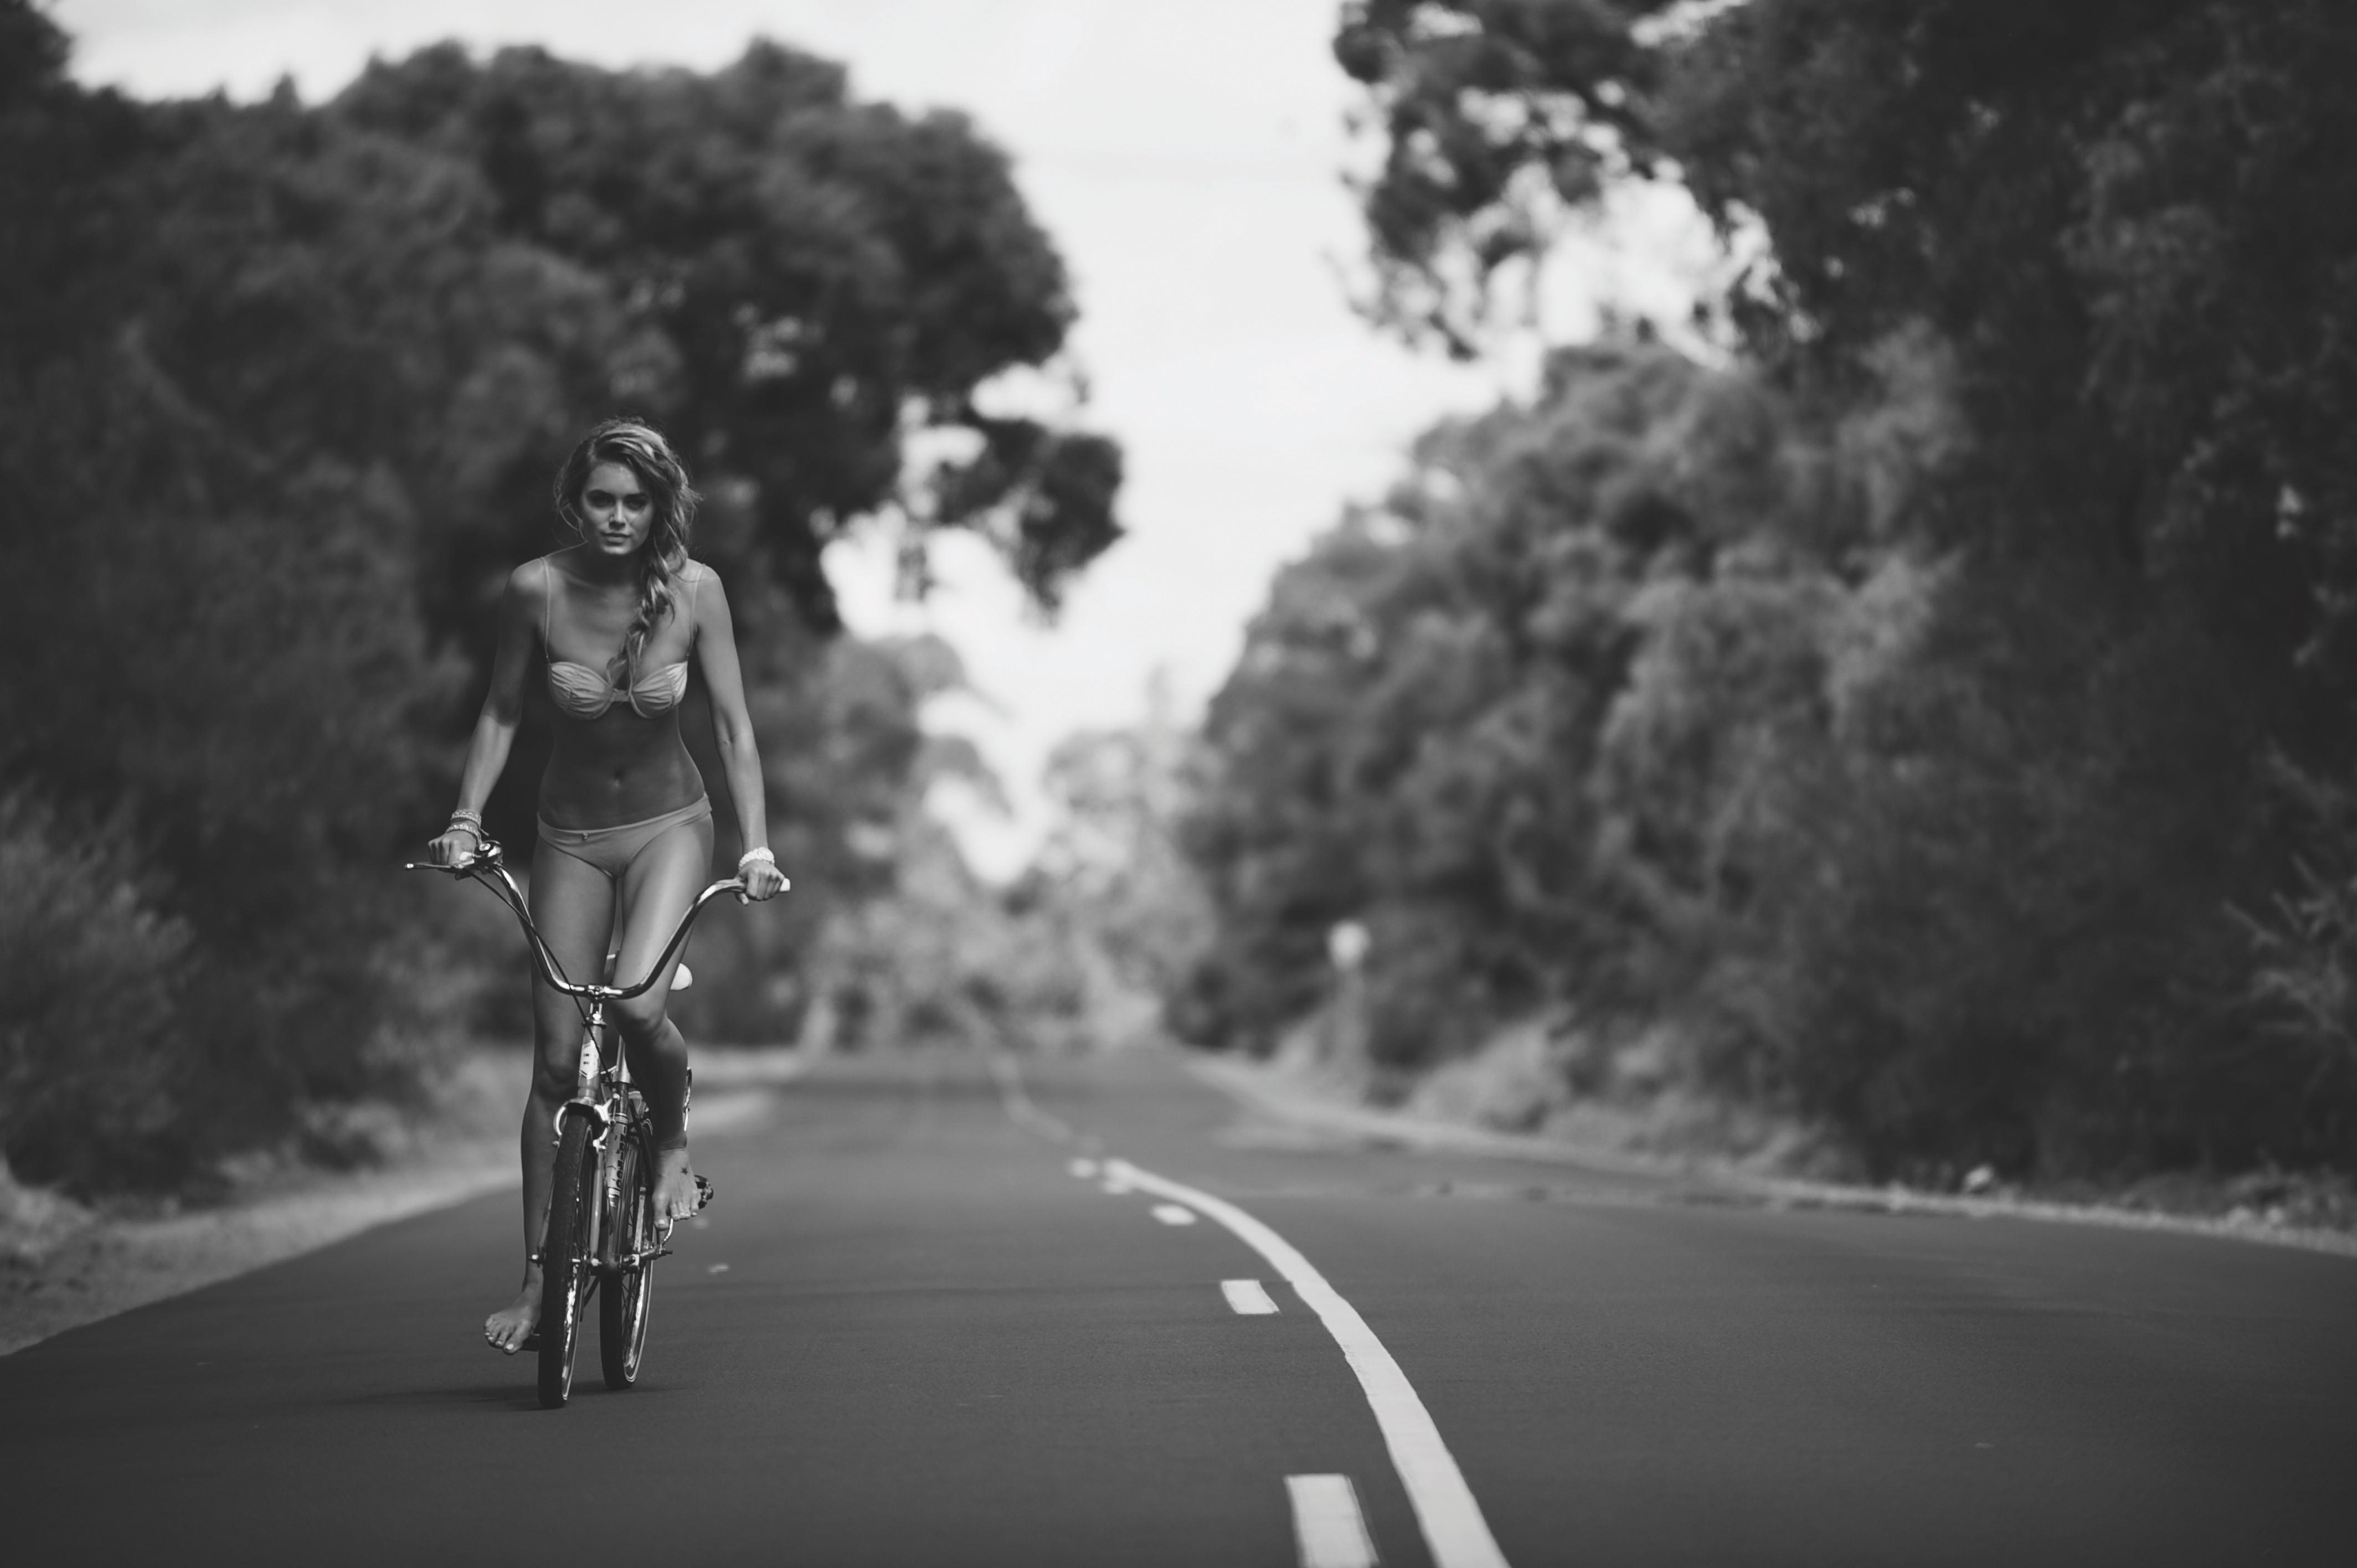 Wallpaper Sports Women Model Bicycle Vehicle Bikini